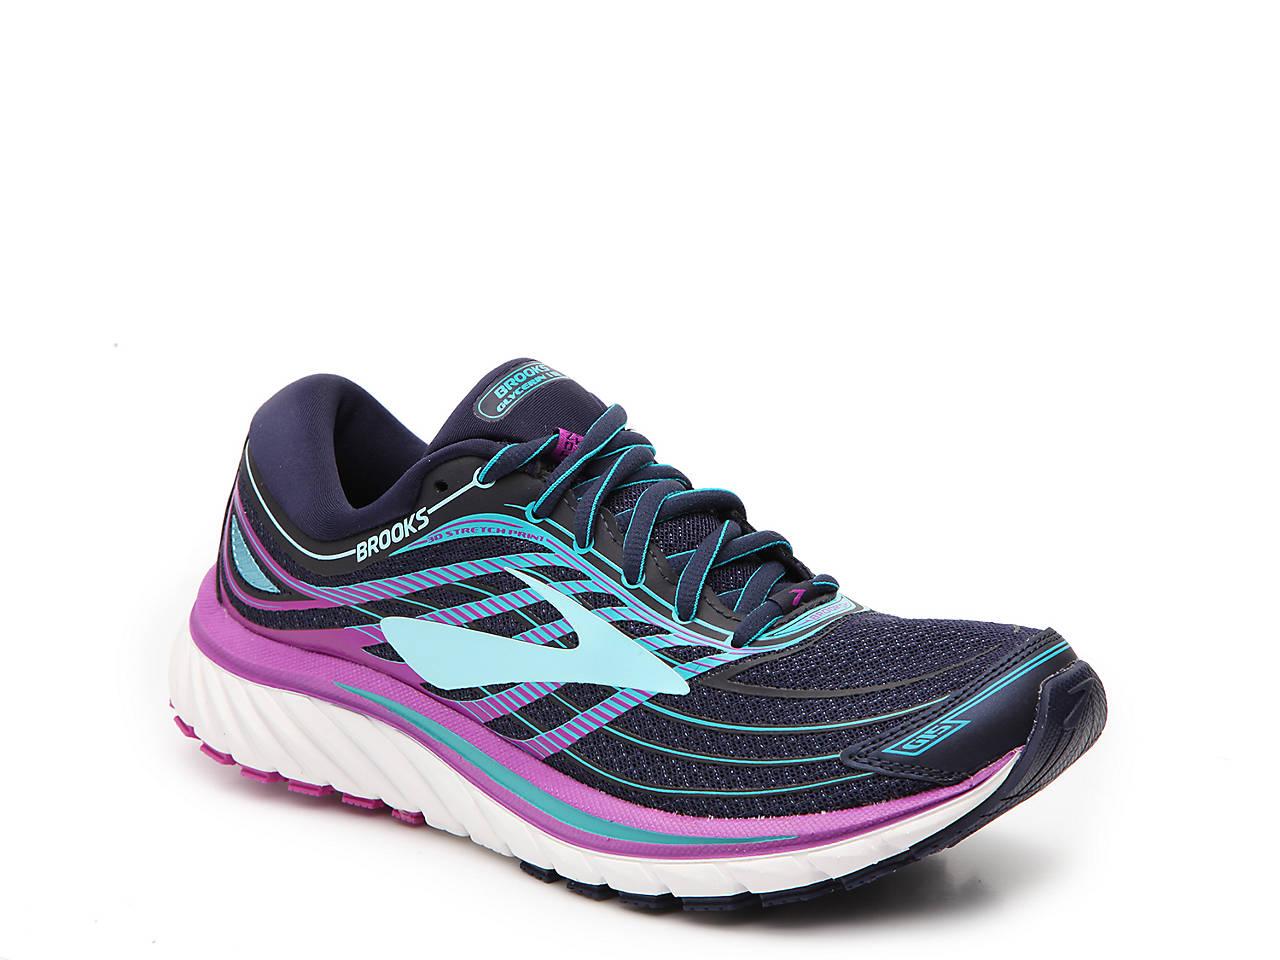 c30f8707342 Brooks Glycerin 15 Performance Running Shoe - Women s Women s Shoes ...